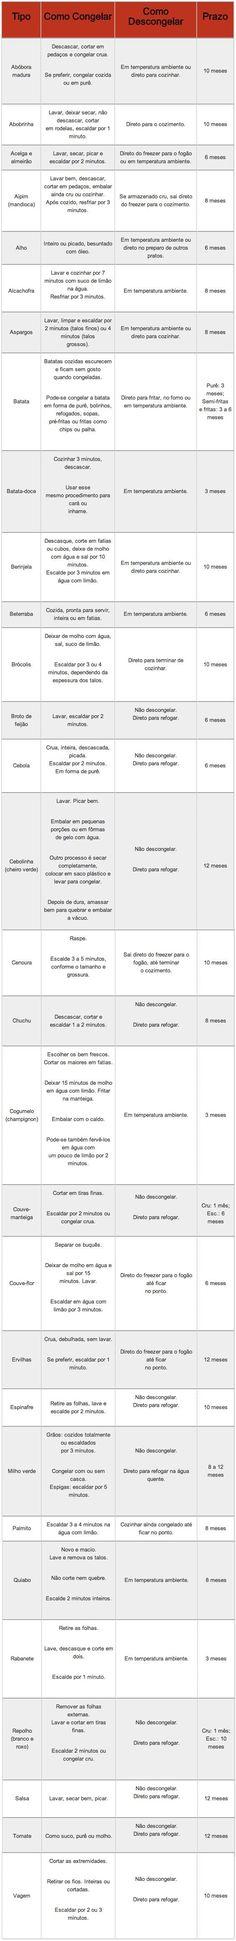 tabela 2 congelar vegetais